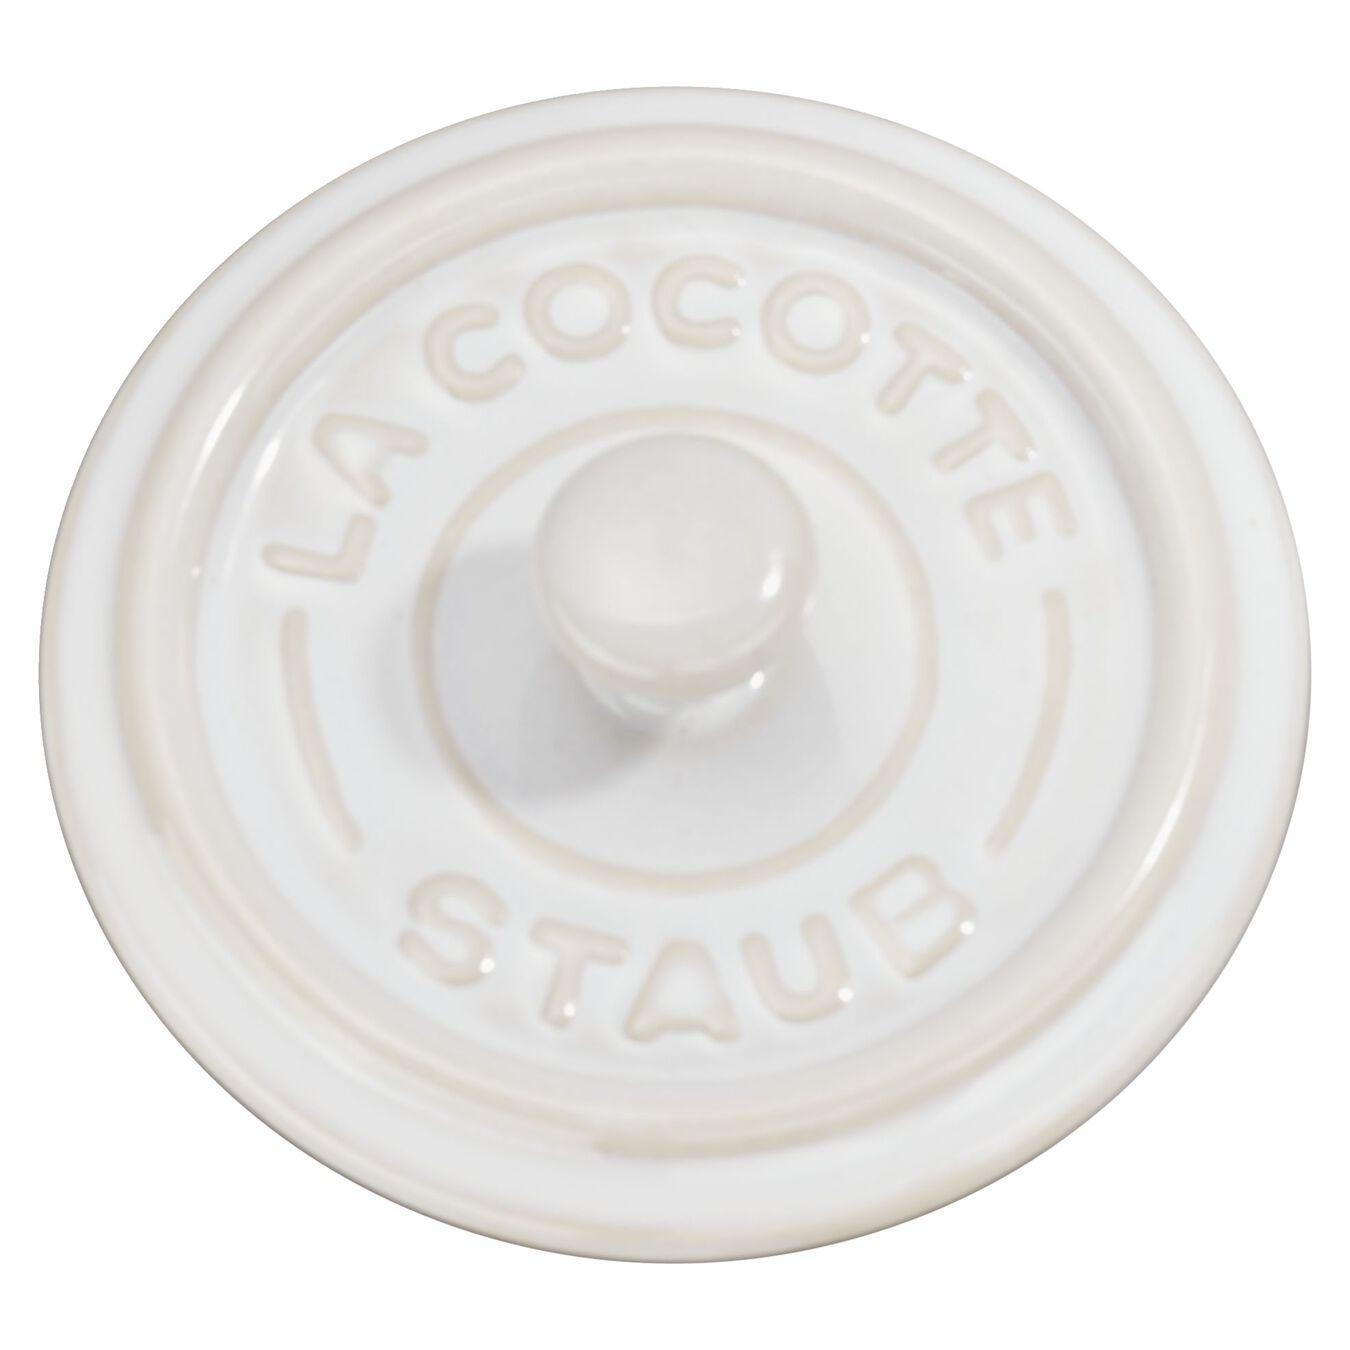 3-pc Mini Round Cocotte Set - Rustic Ivory,,large 7